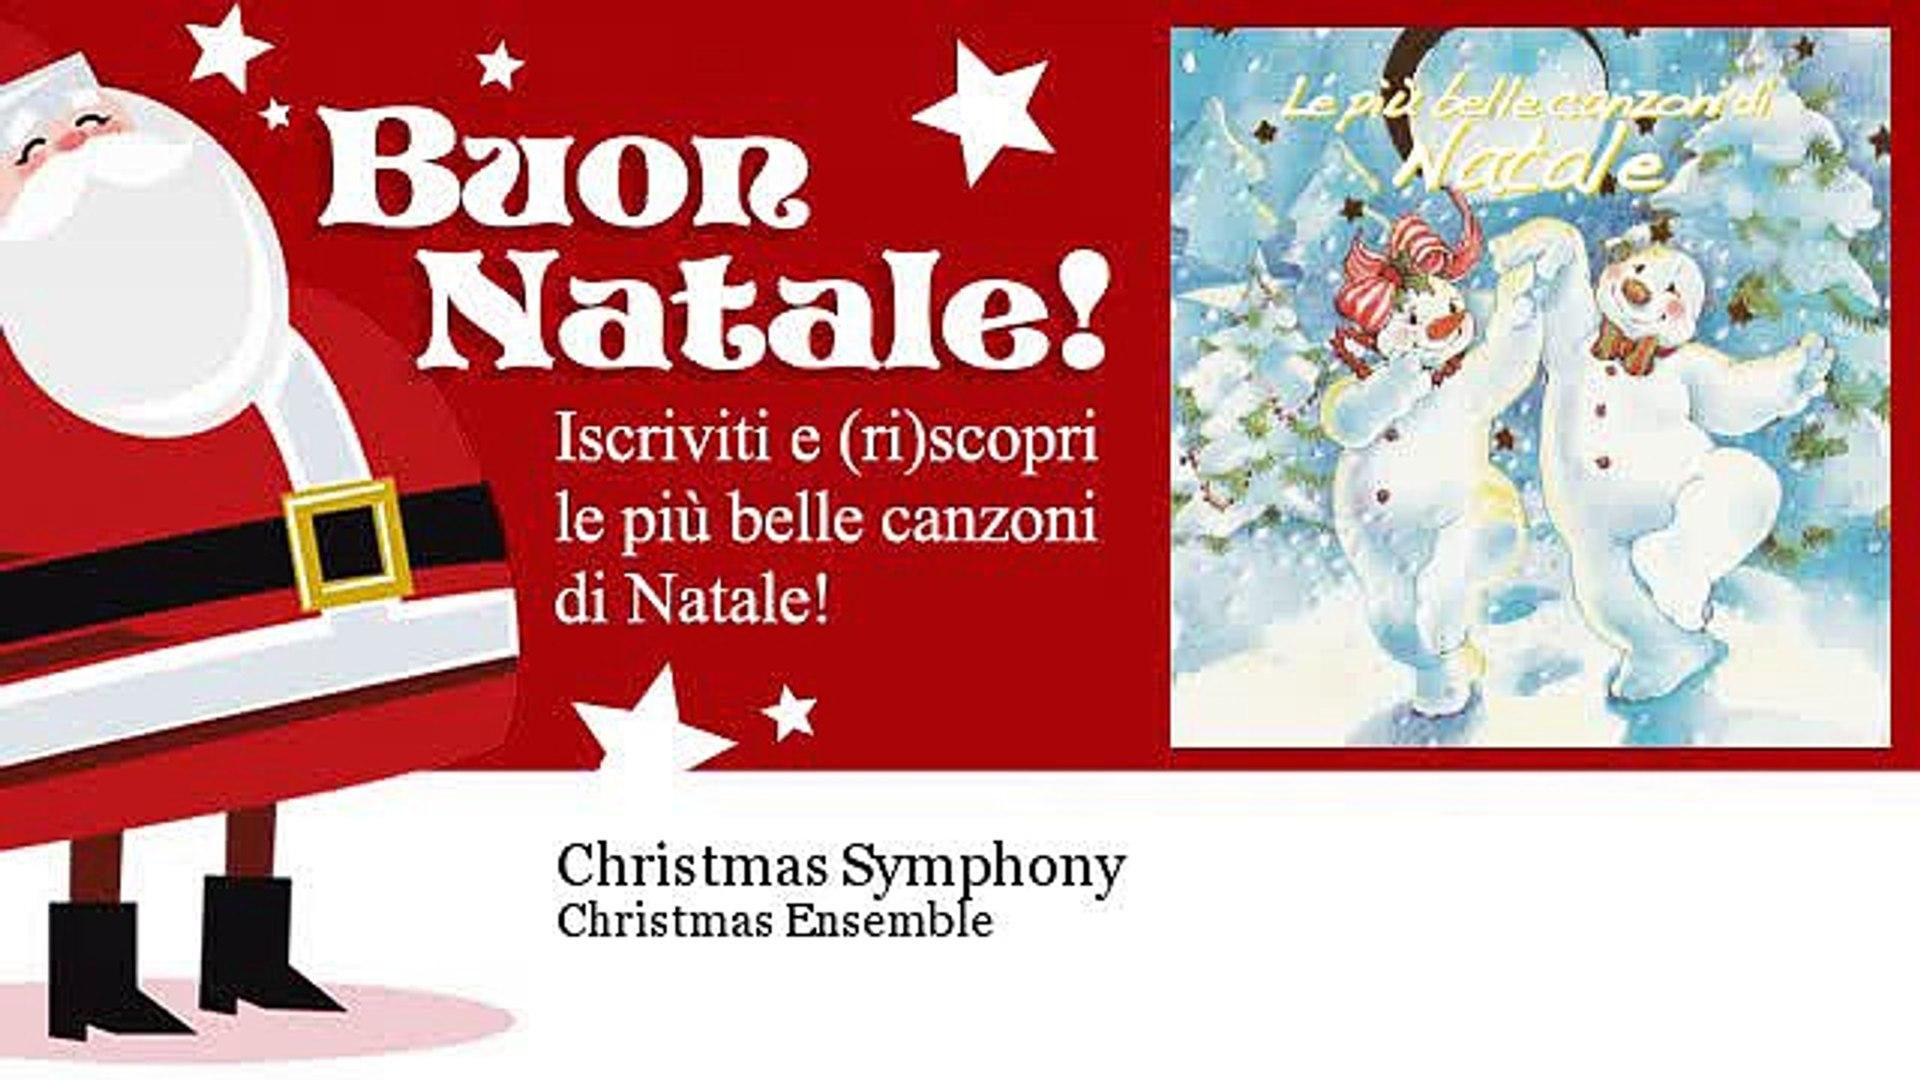 Christmas Ensemble - Christmas Symphony